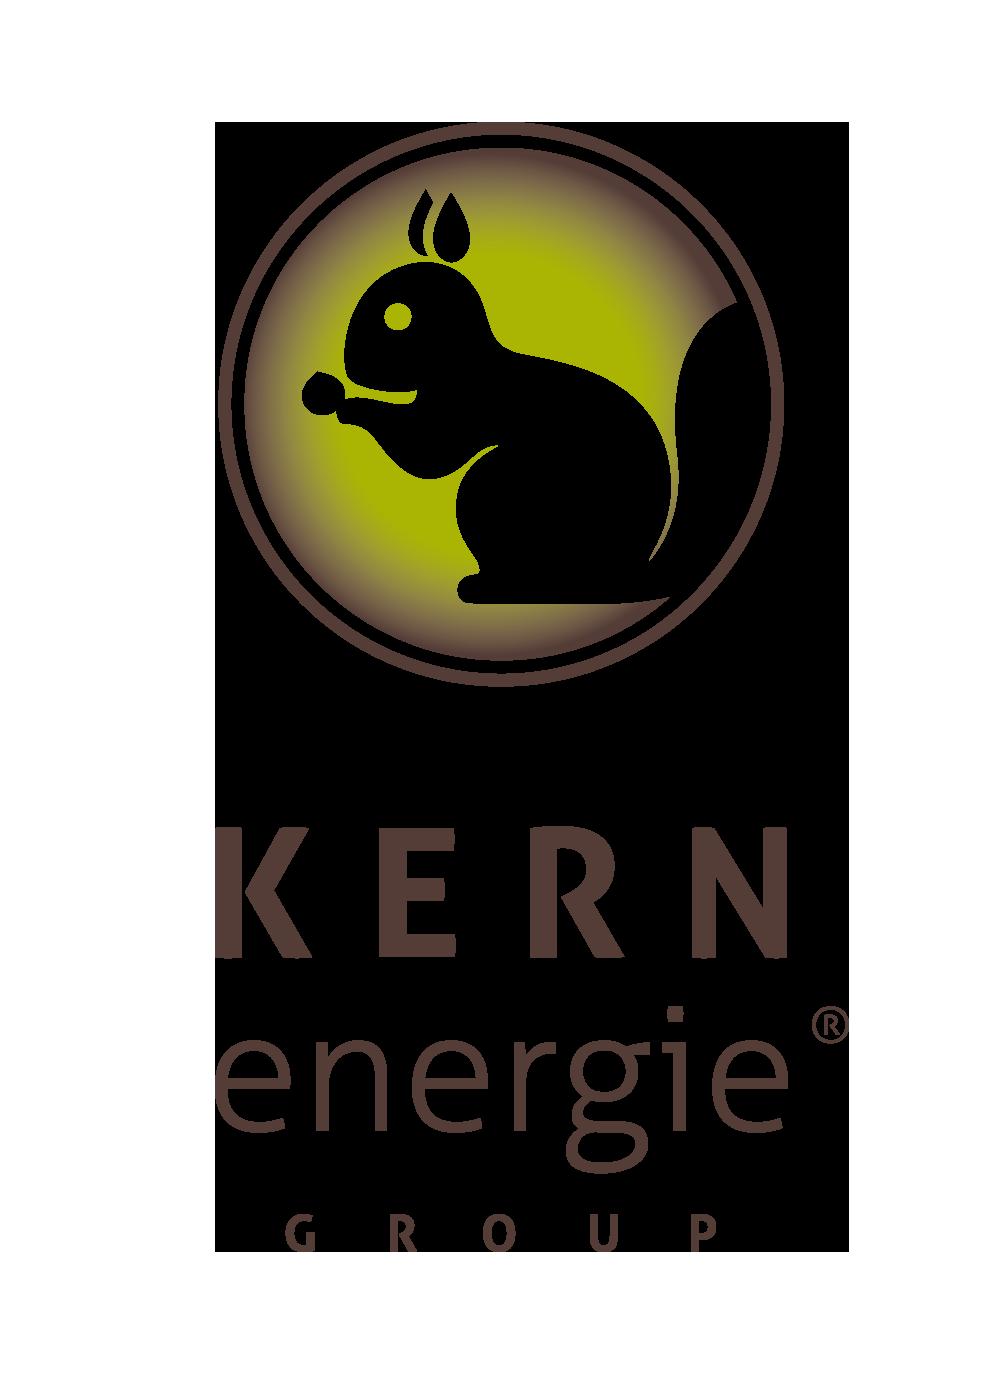 Junior Foodfotograf (m/w/d) - Job Hamburg - Jobs.KERNenergie